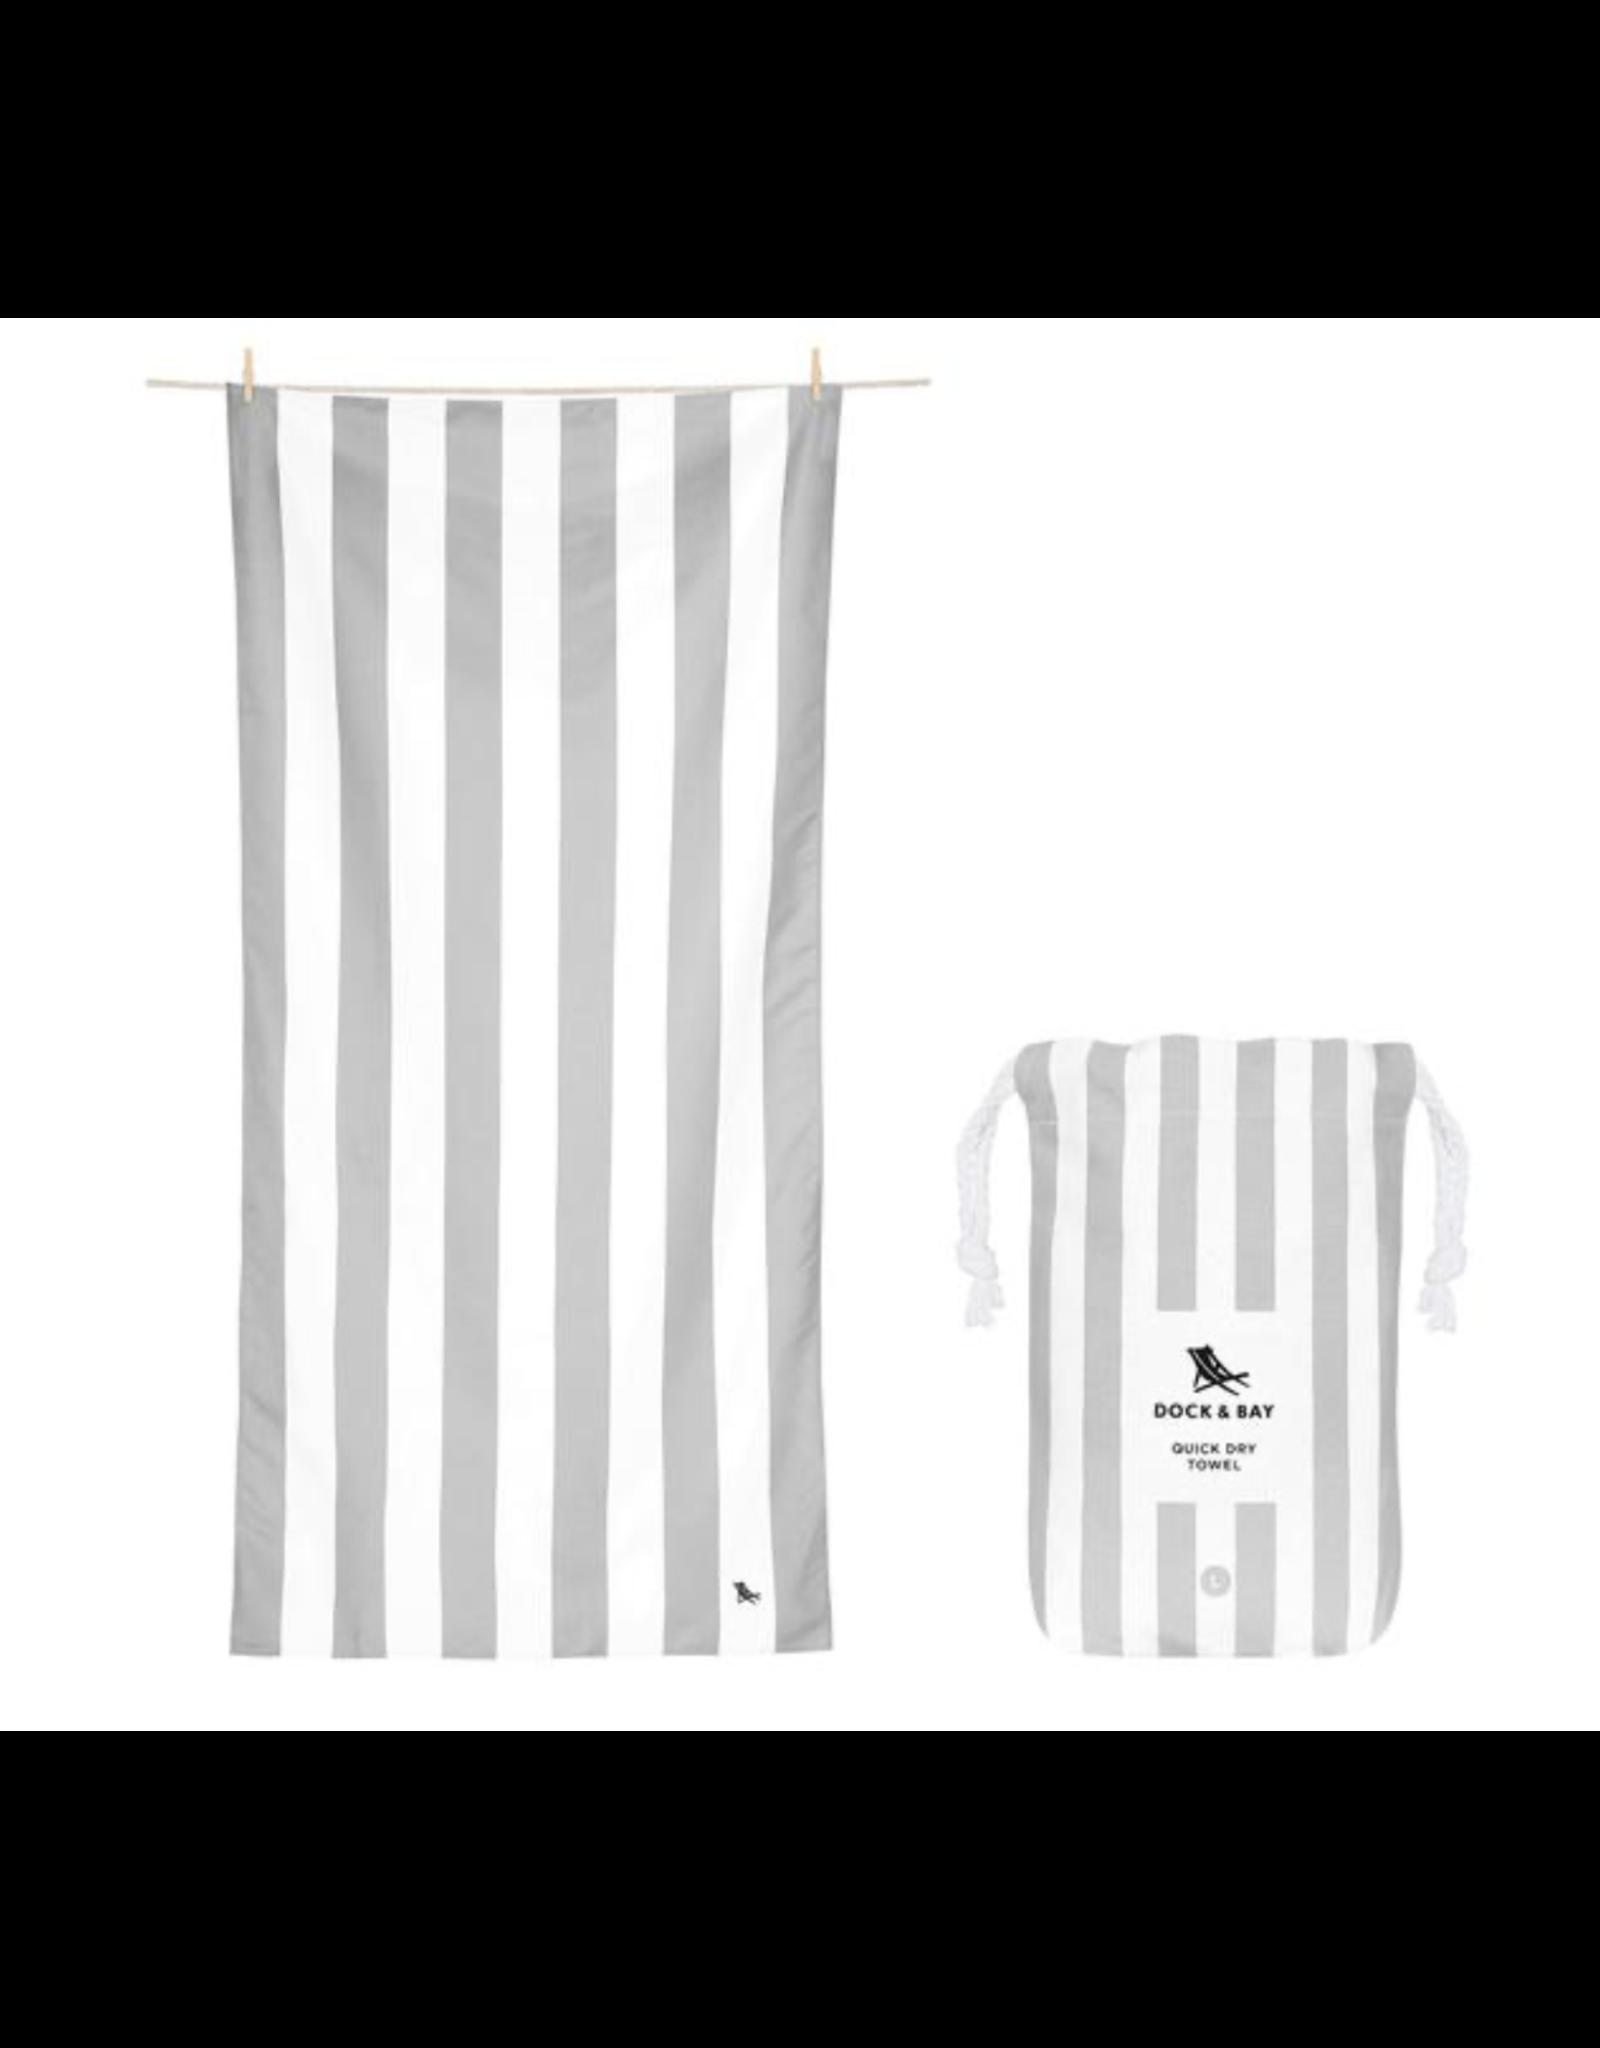 Dock & Bay Towel Cabana Goa Grey